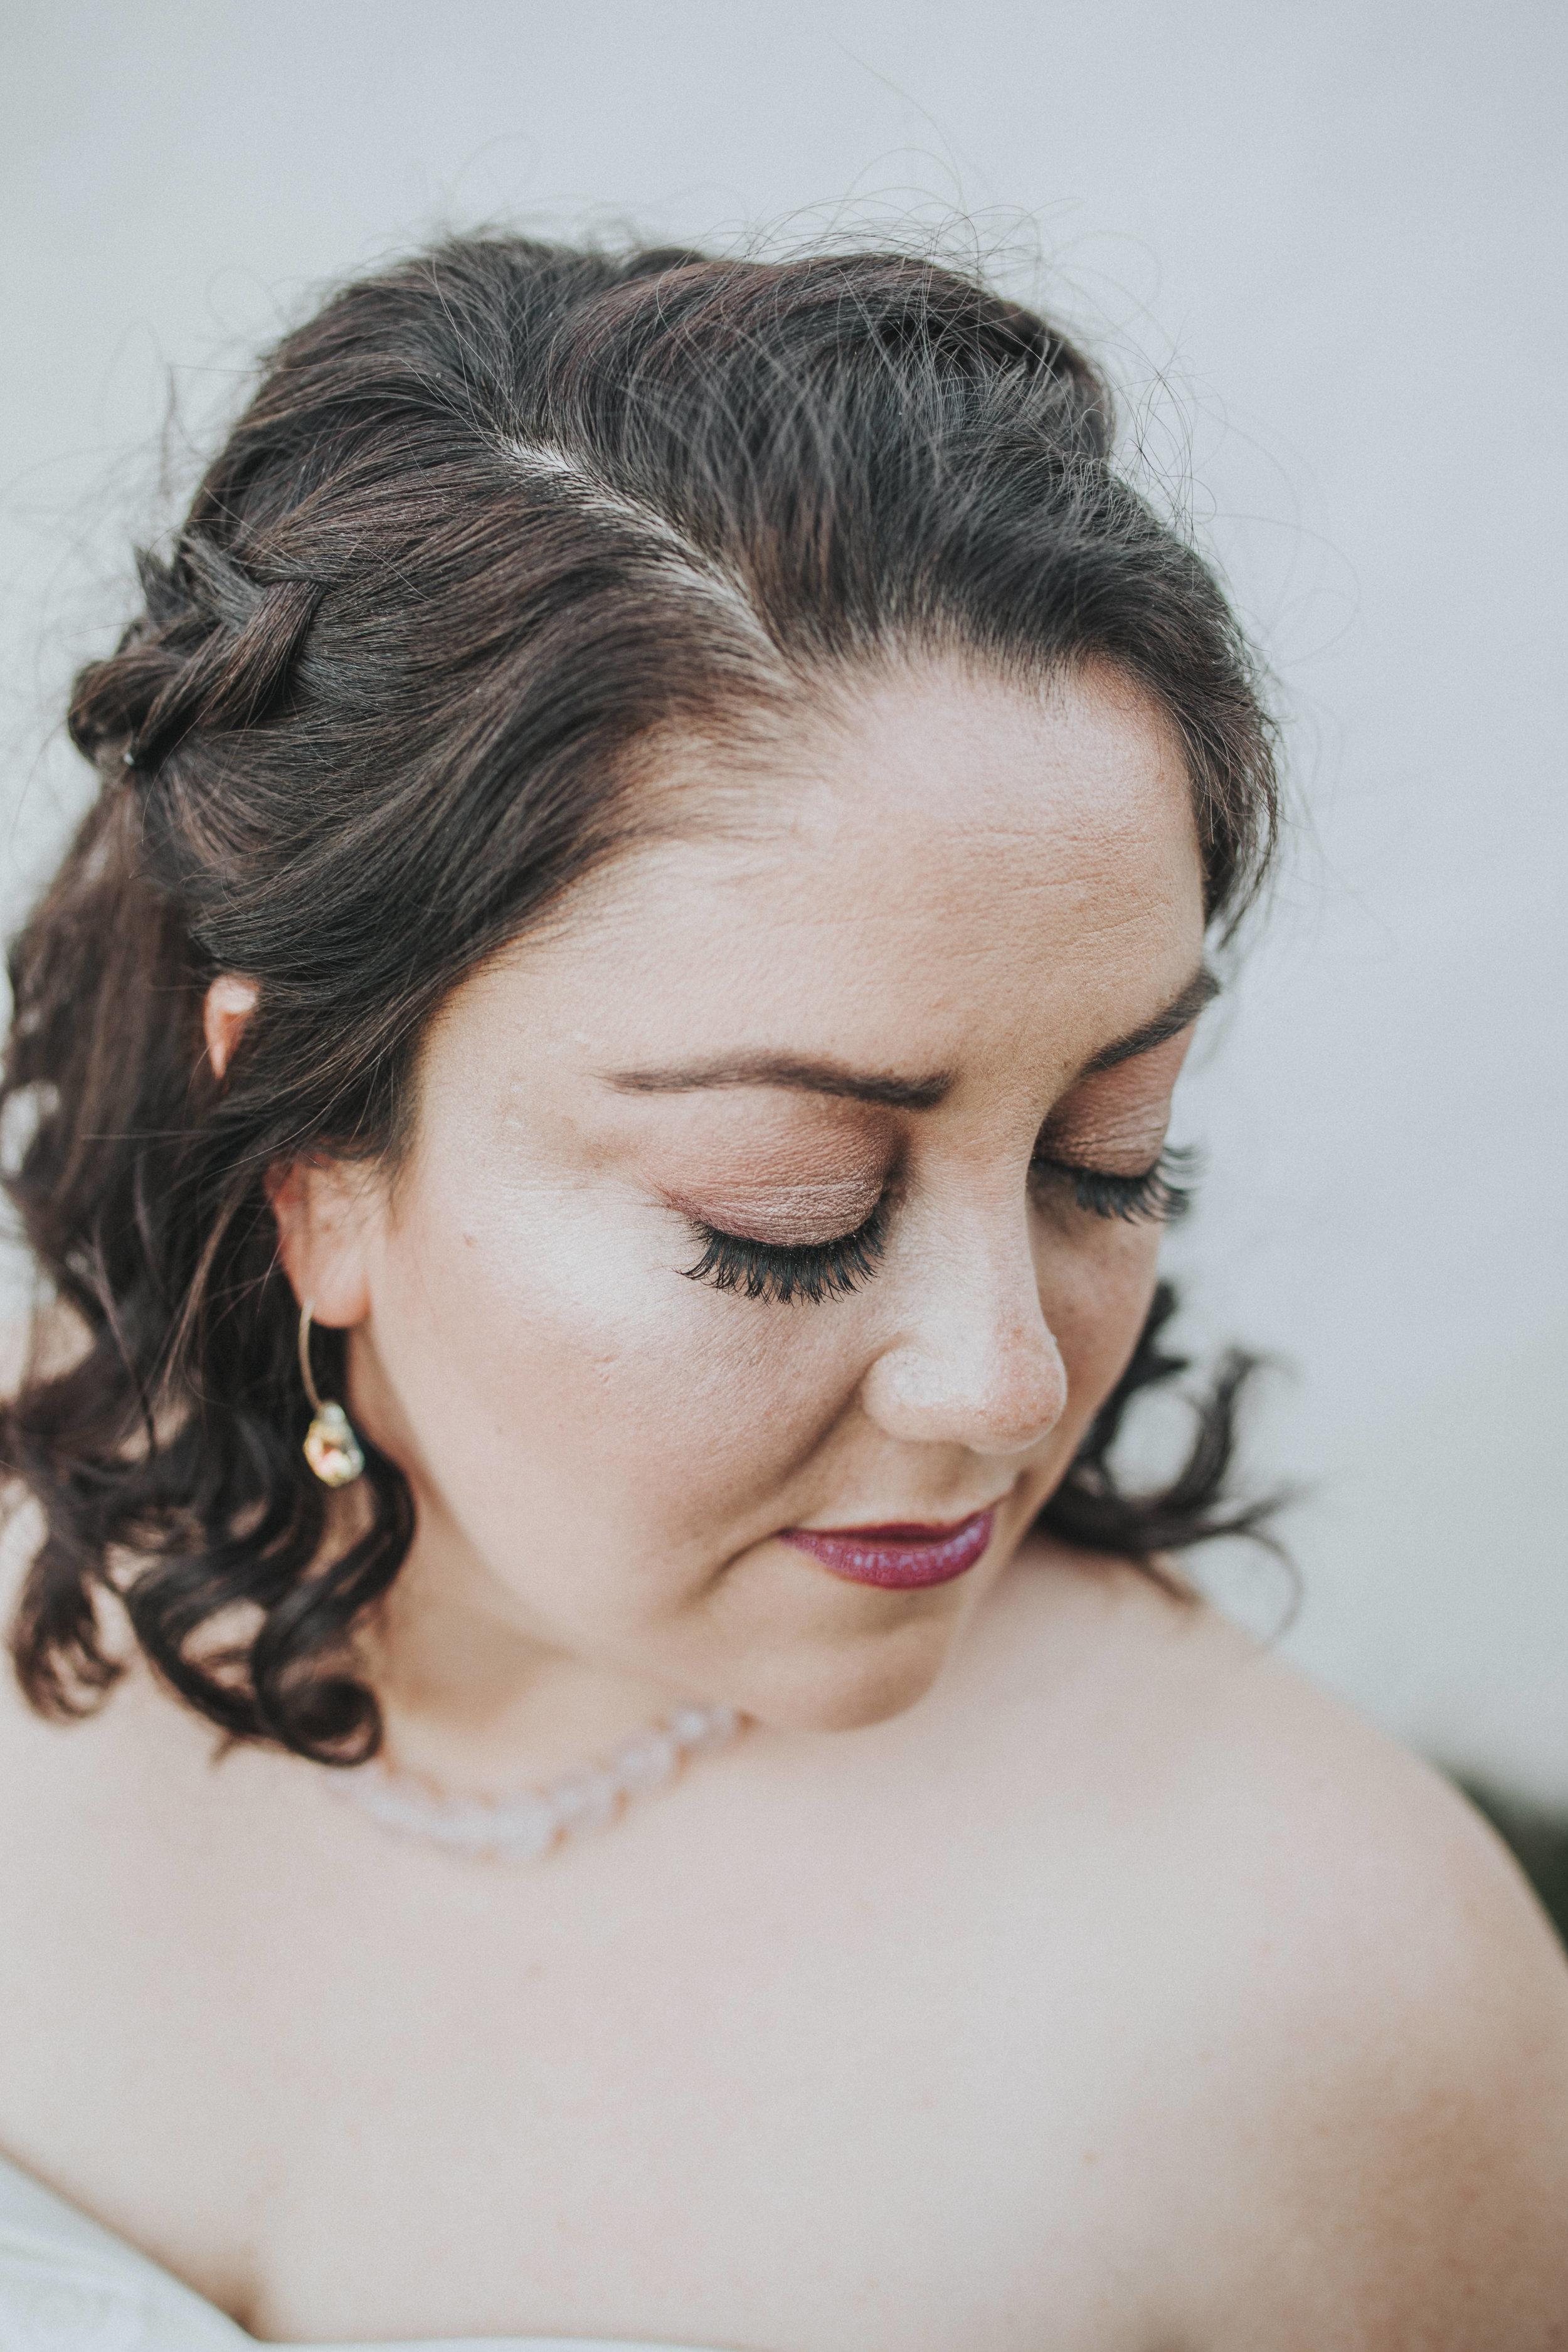 112 midwest-colorado-nebraska-elopement-photography-gretna-turtledoves.jpg